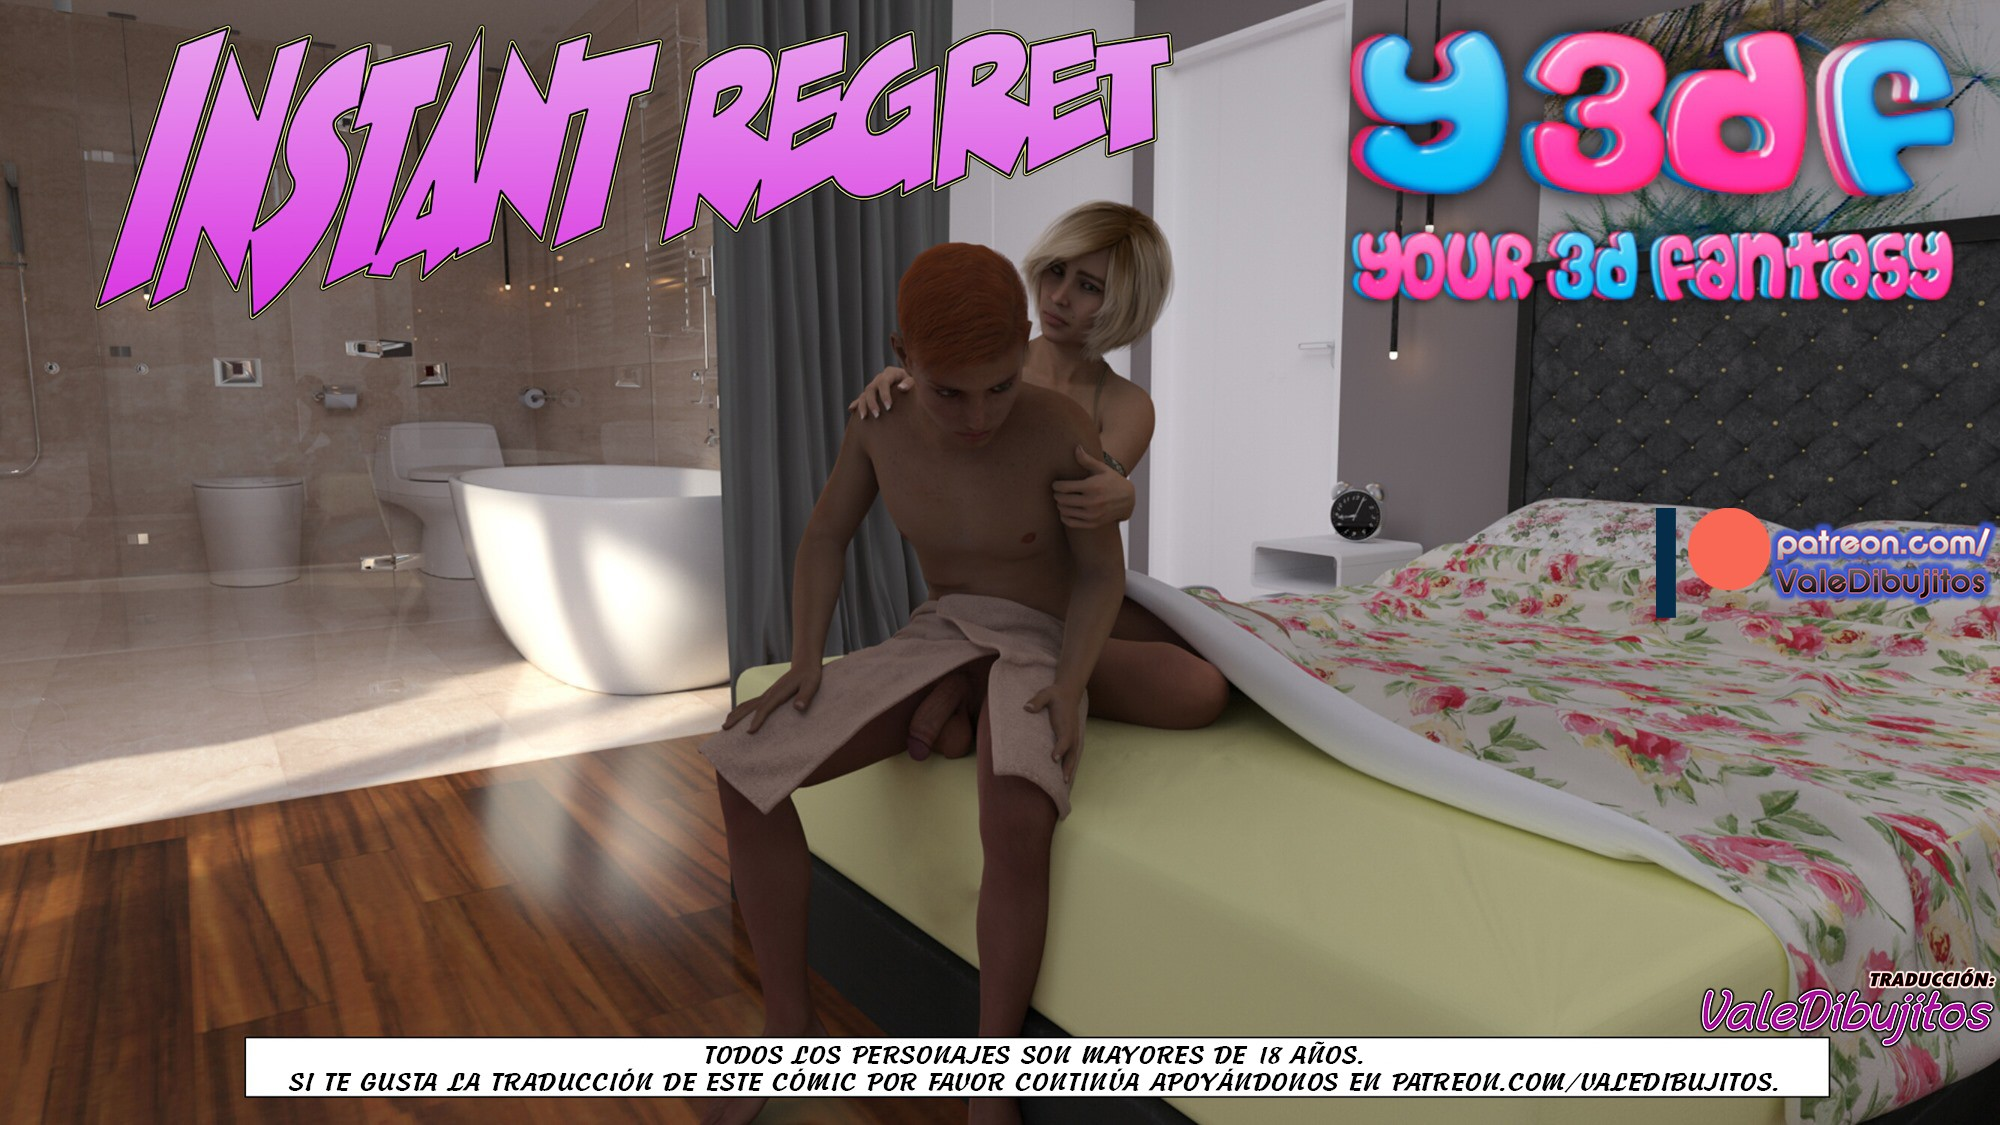 Instant-Regret-01.jpg